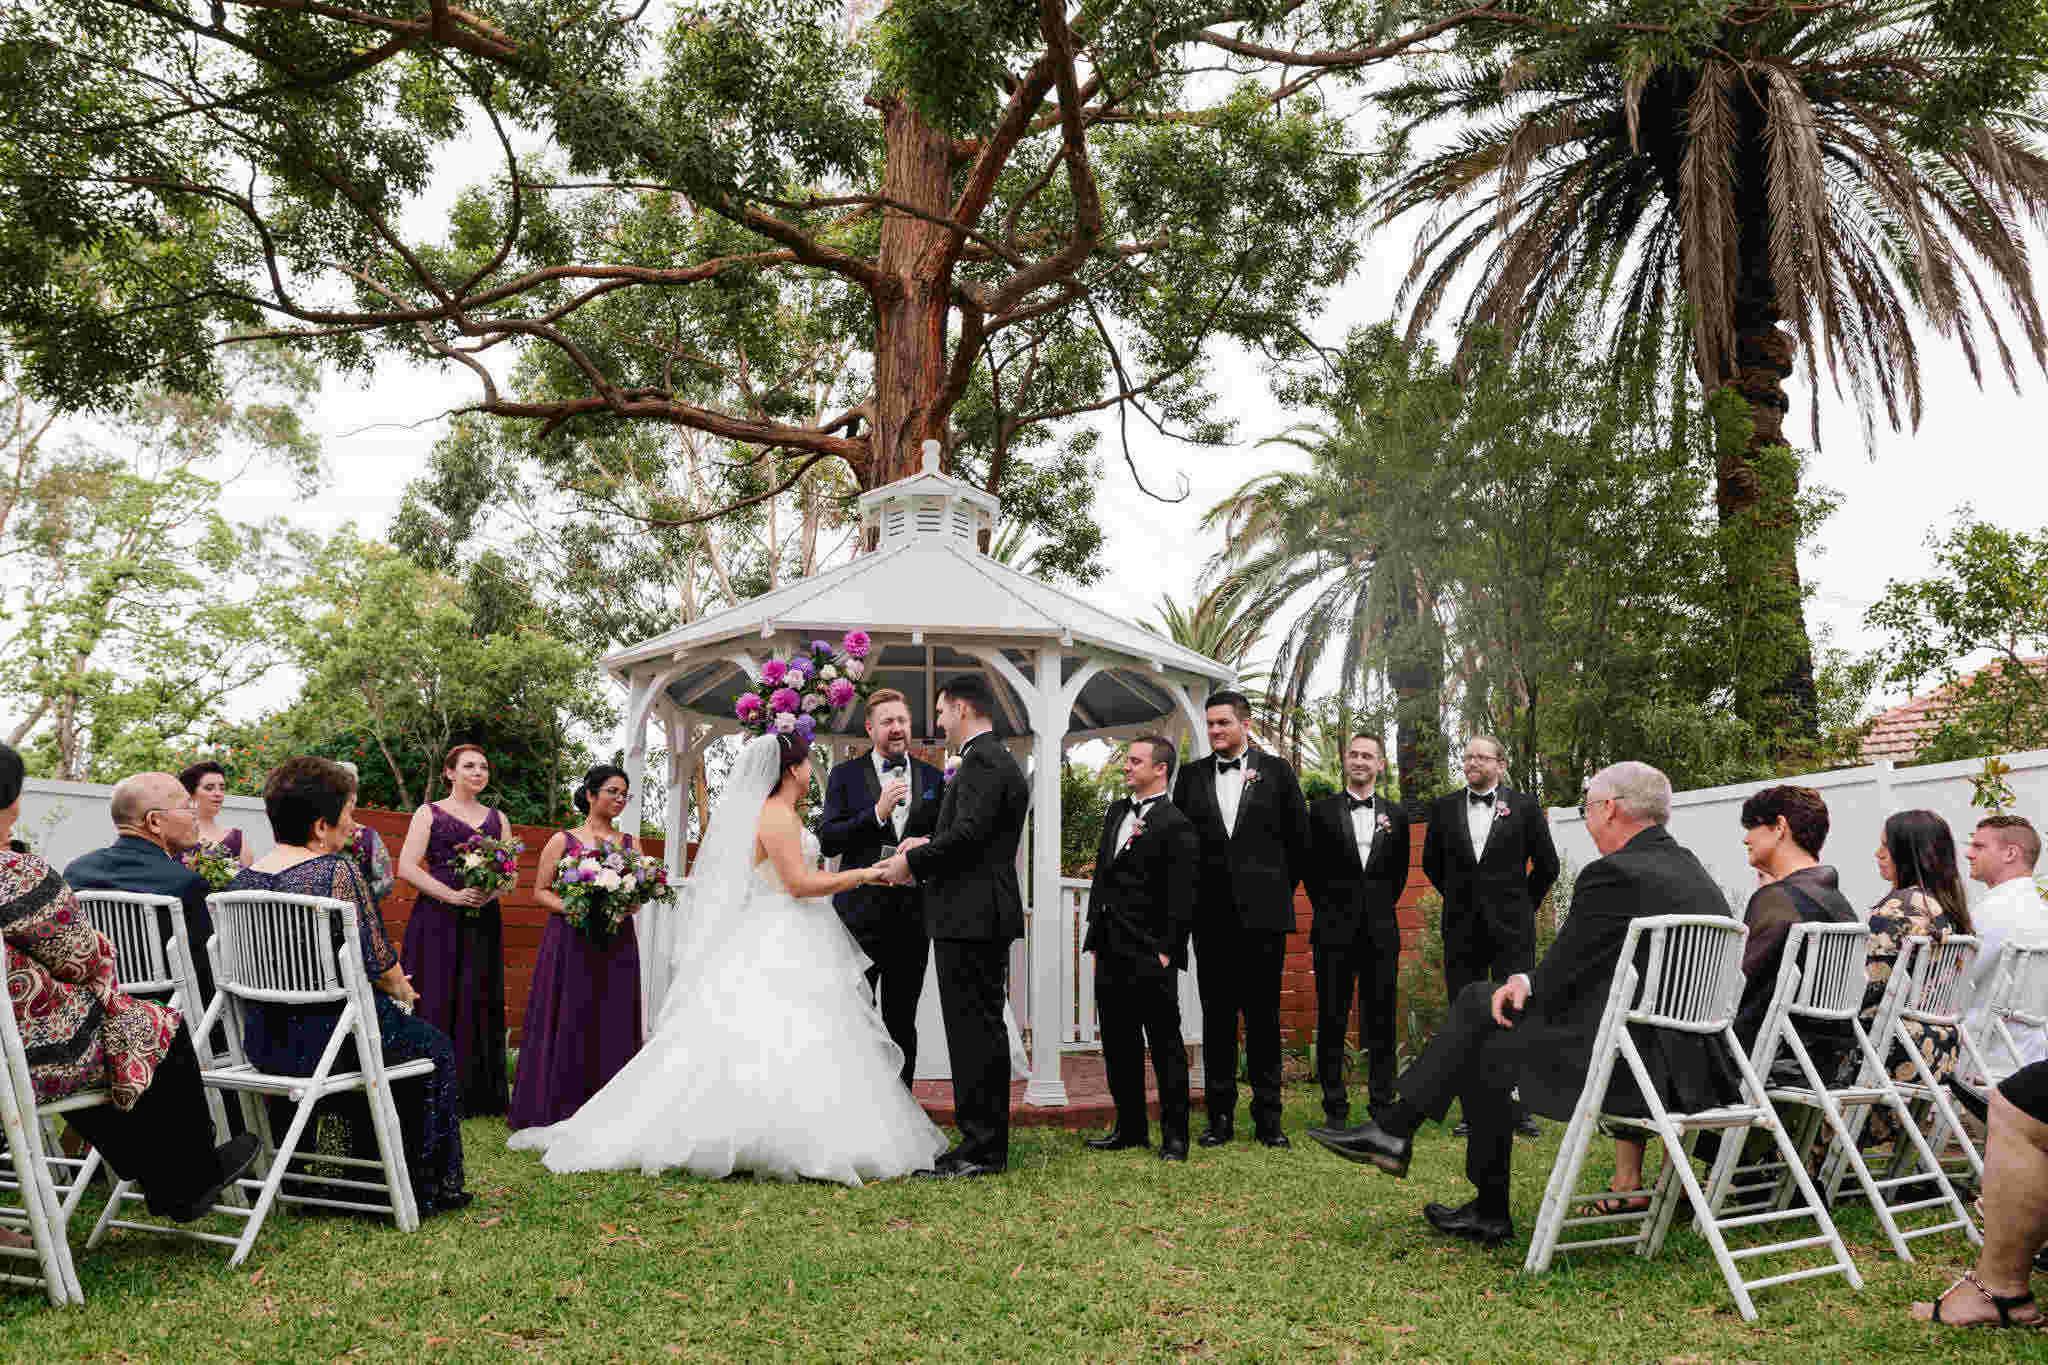 Cropley House Garden Wedding - Stephen Lee Marriage Celebrant Sydney Male